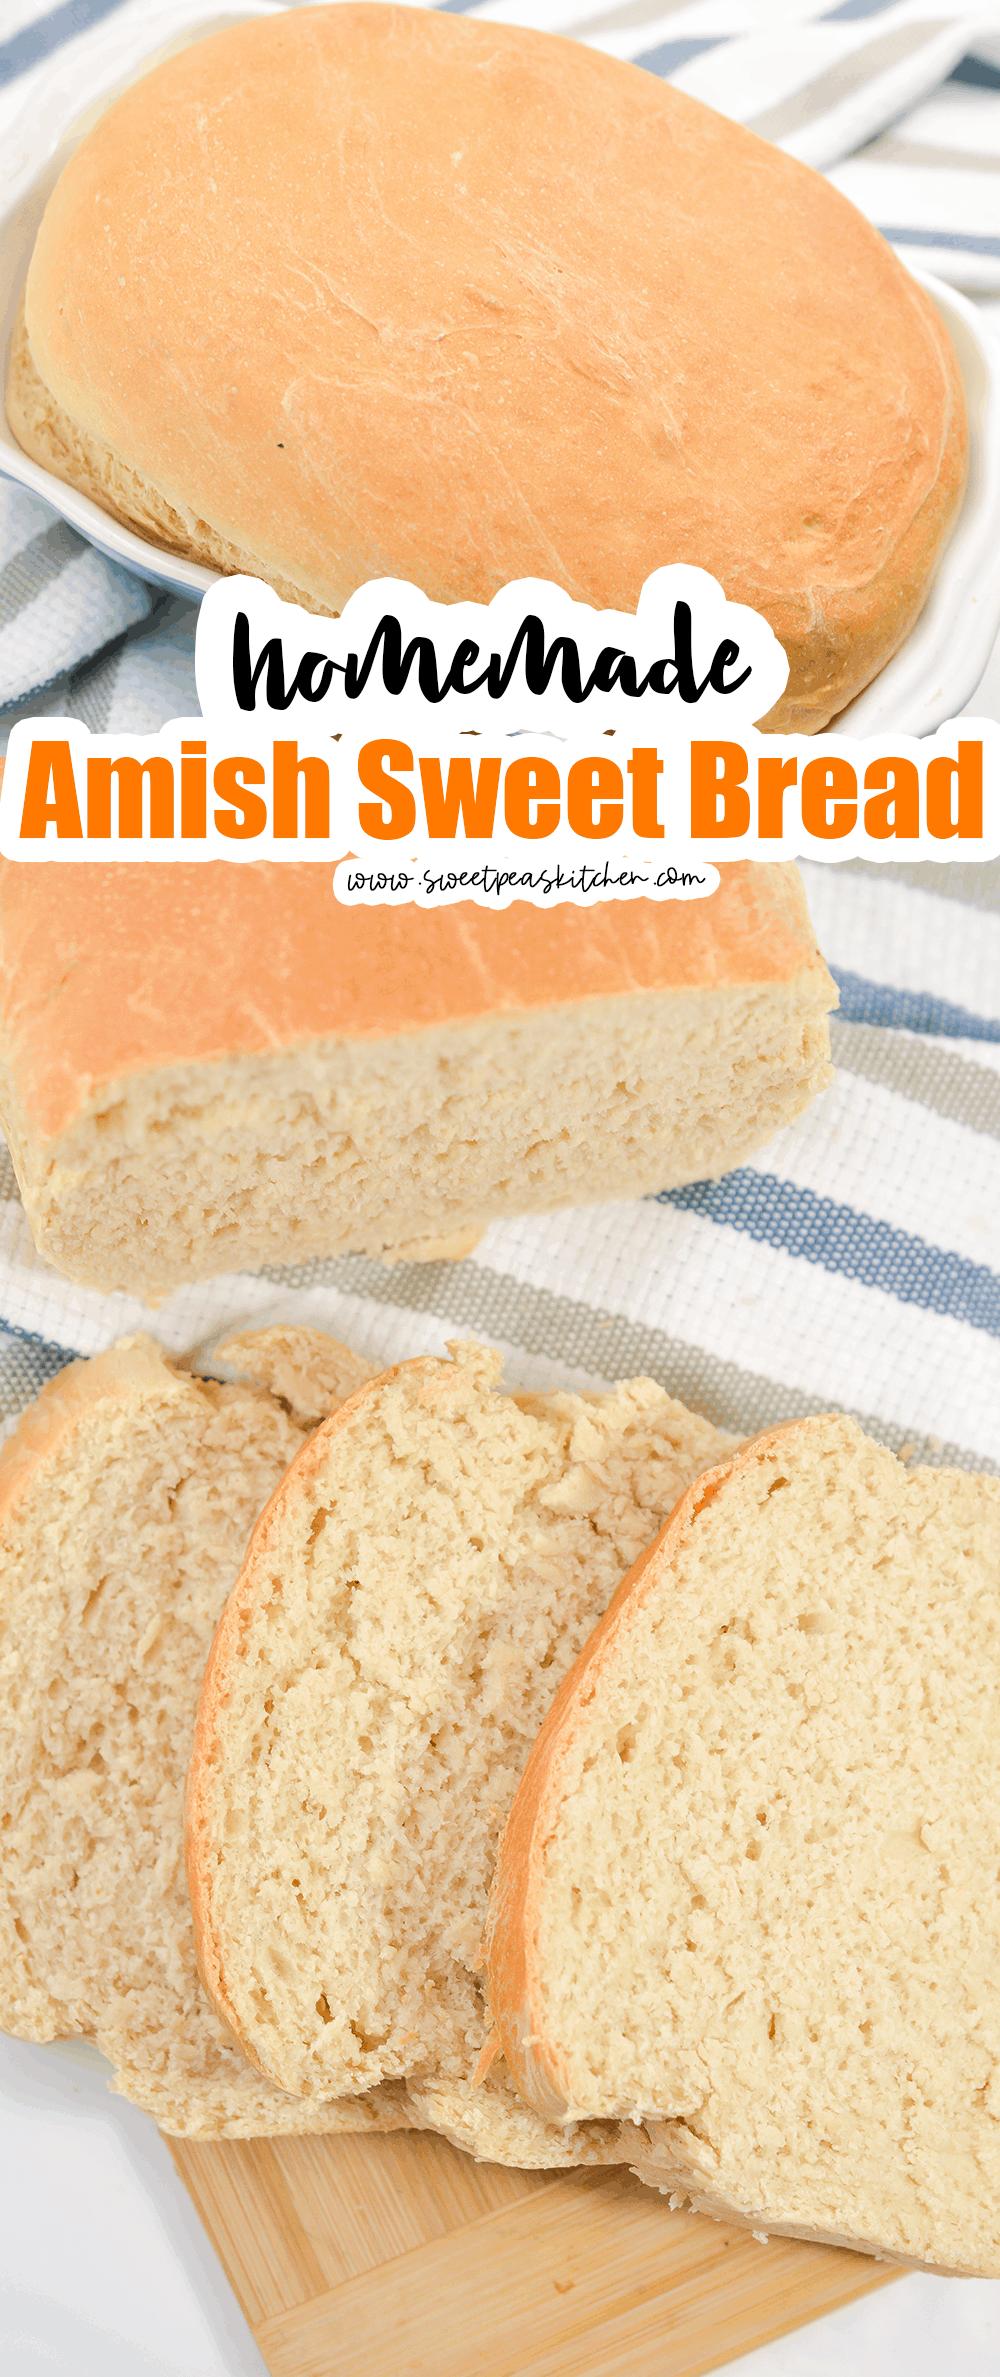 Homemade Amish Sweet Bread